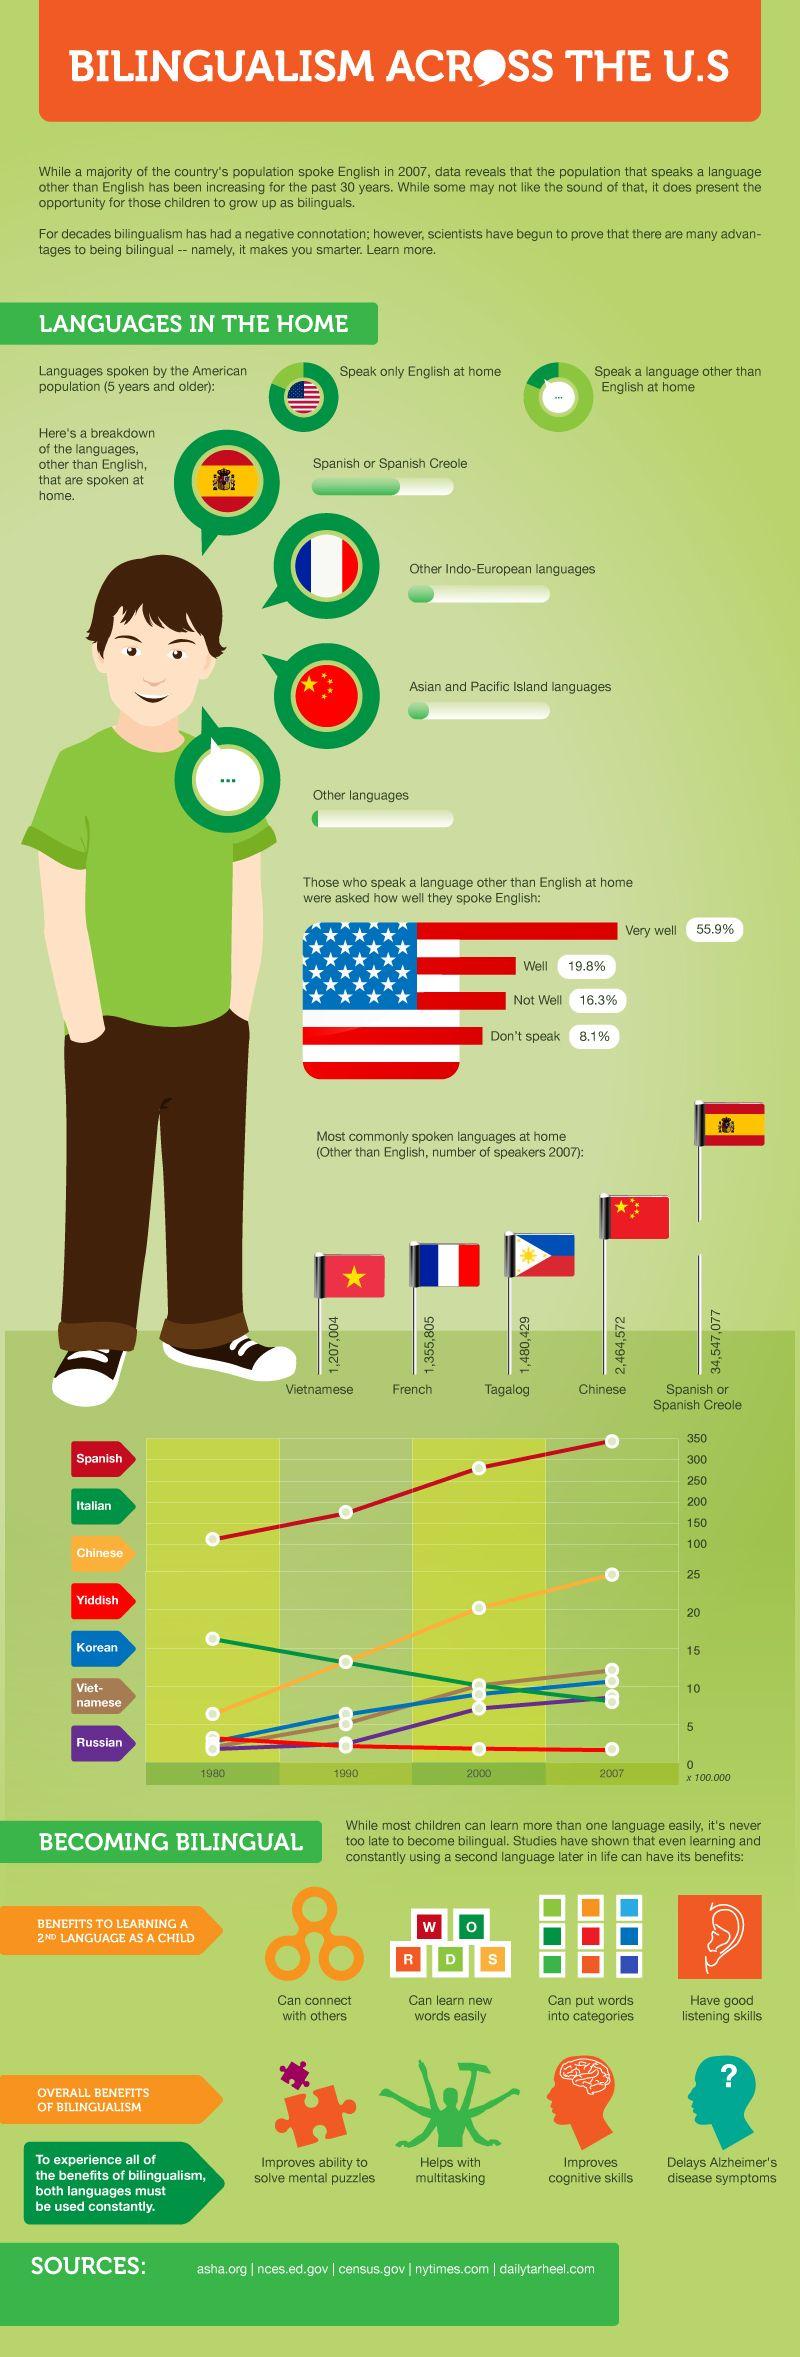 ESL.com | Learn English in the USA - Learn English | ESL.com